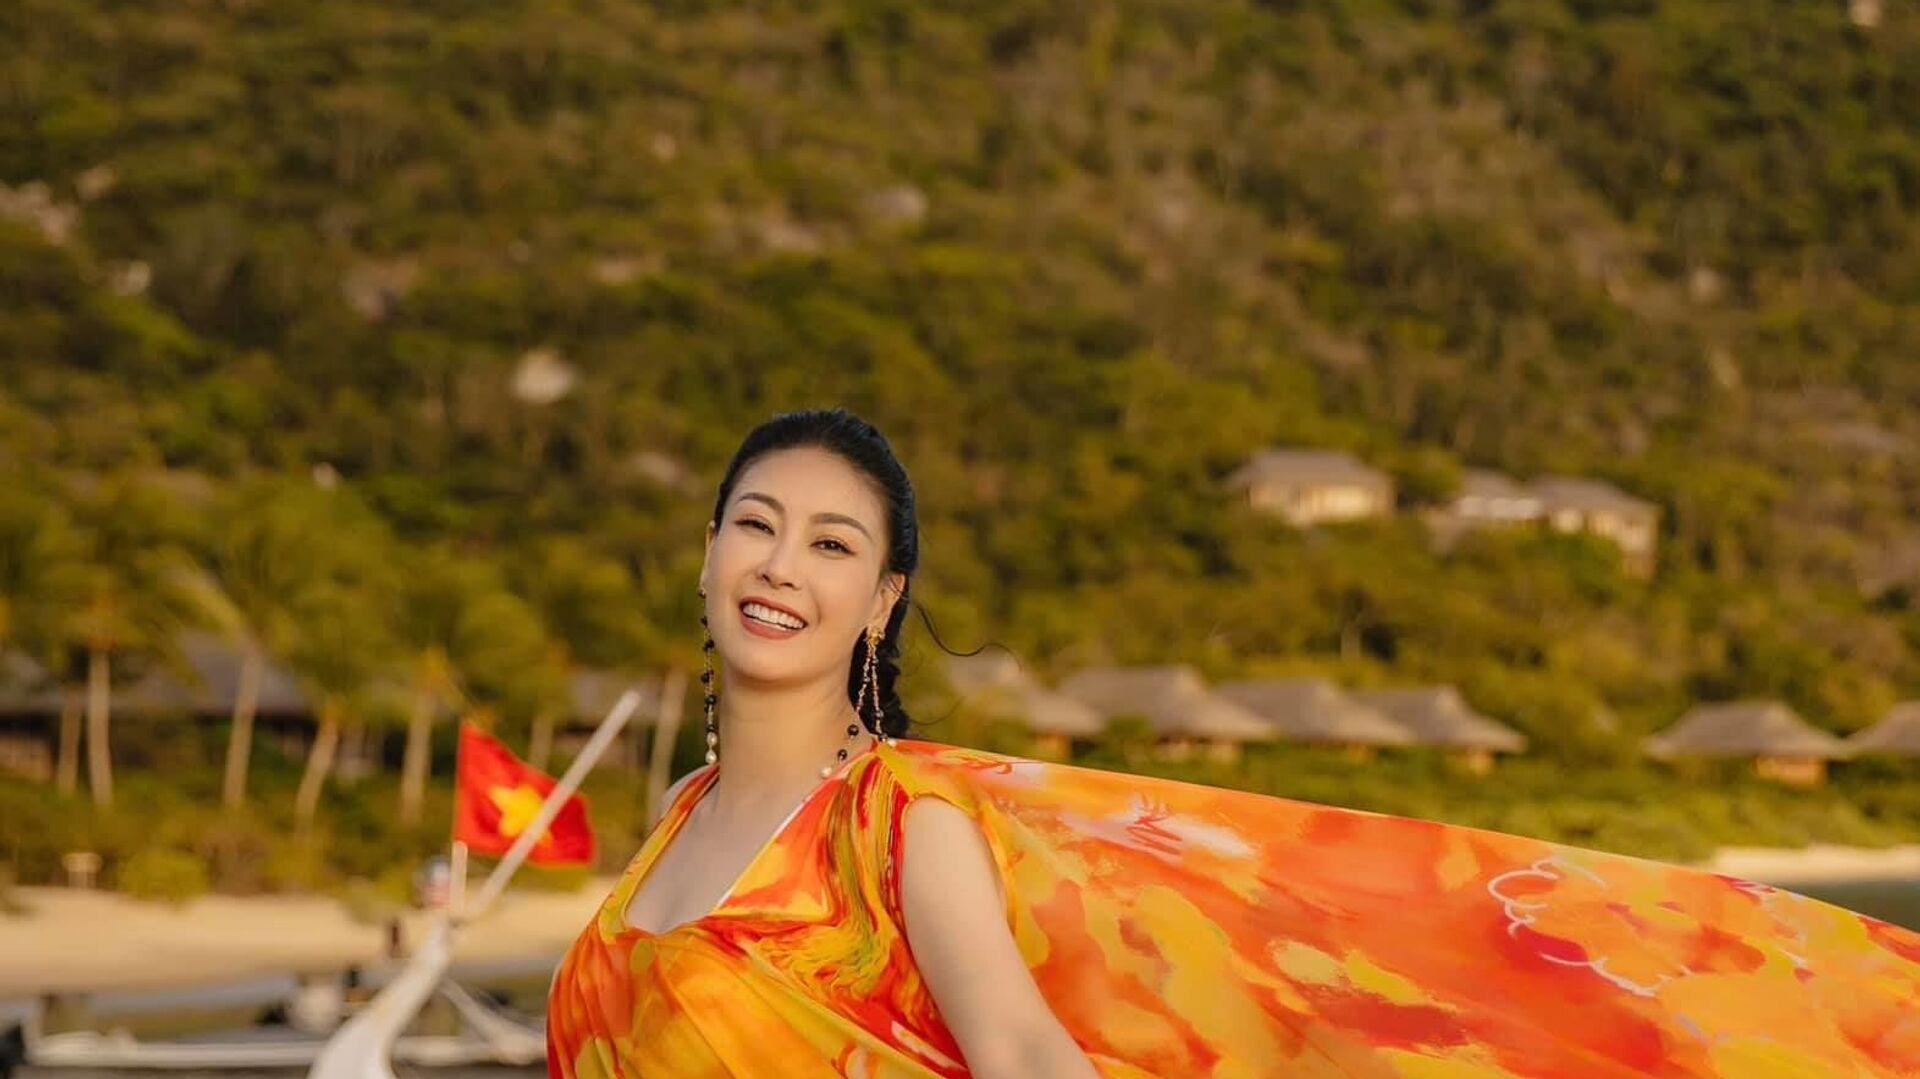 Hoa hậu Hà Kiều Anh - Sputnik Việt Nam, 1920, 29.06.2021